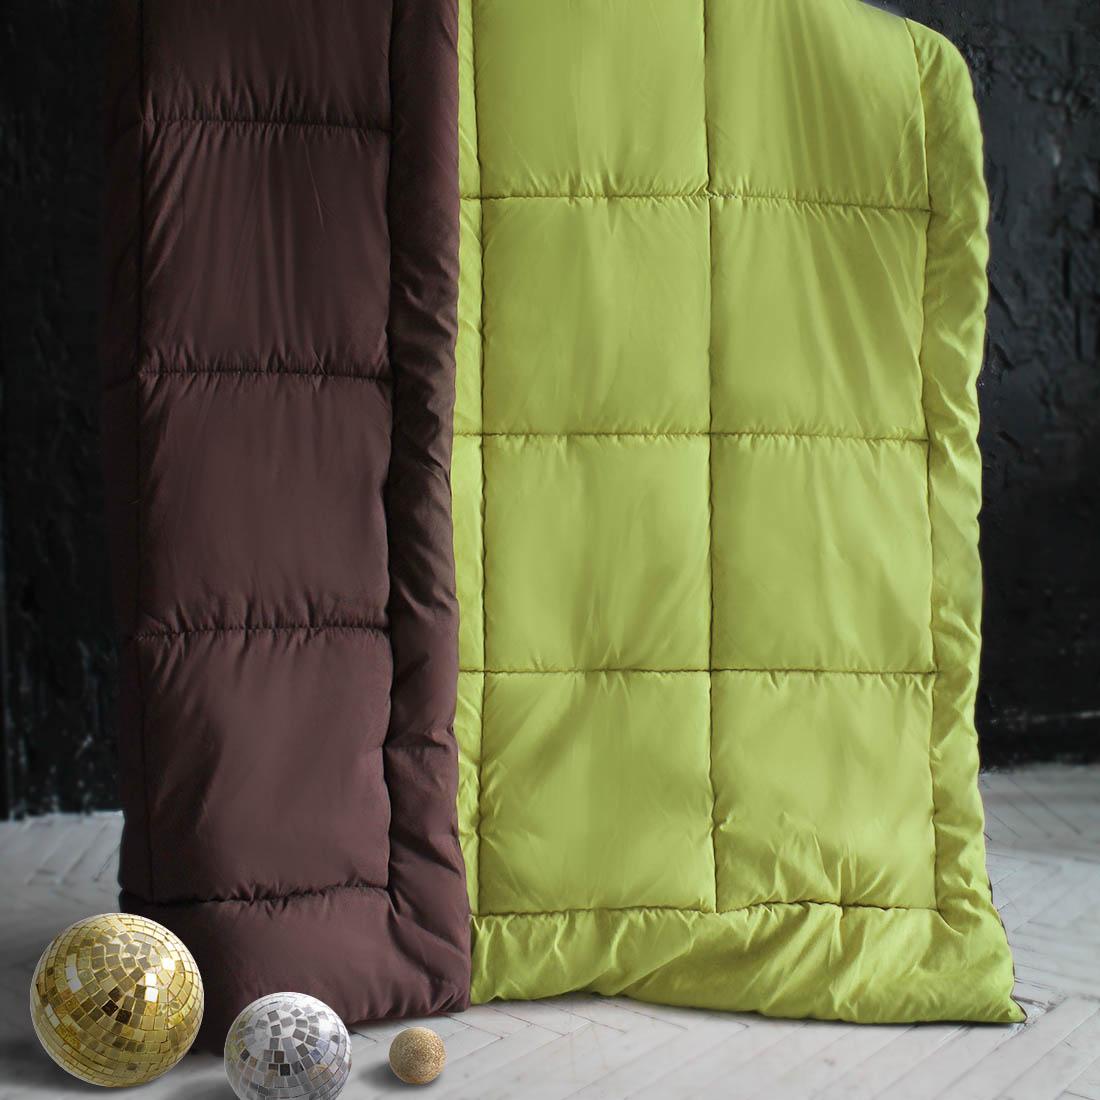 Одеяла Sleep iX Одеяло MiltiColorЦвет: Салатовый/Темно-Коричневый (175х205 см) siemens lc 91 ba 582 ix